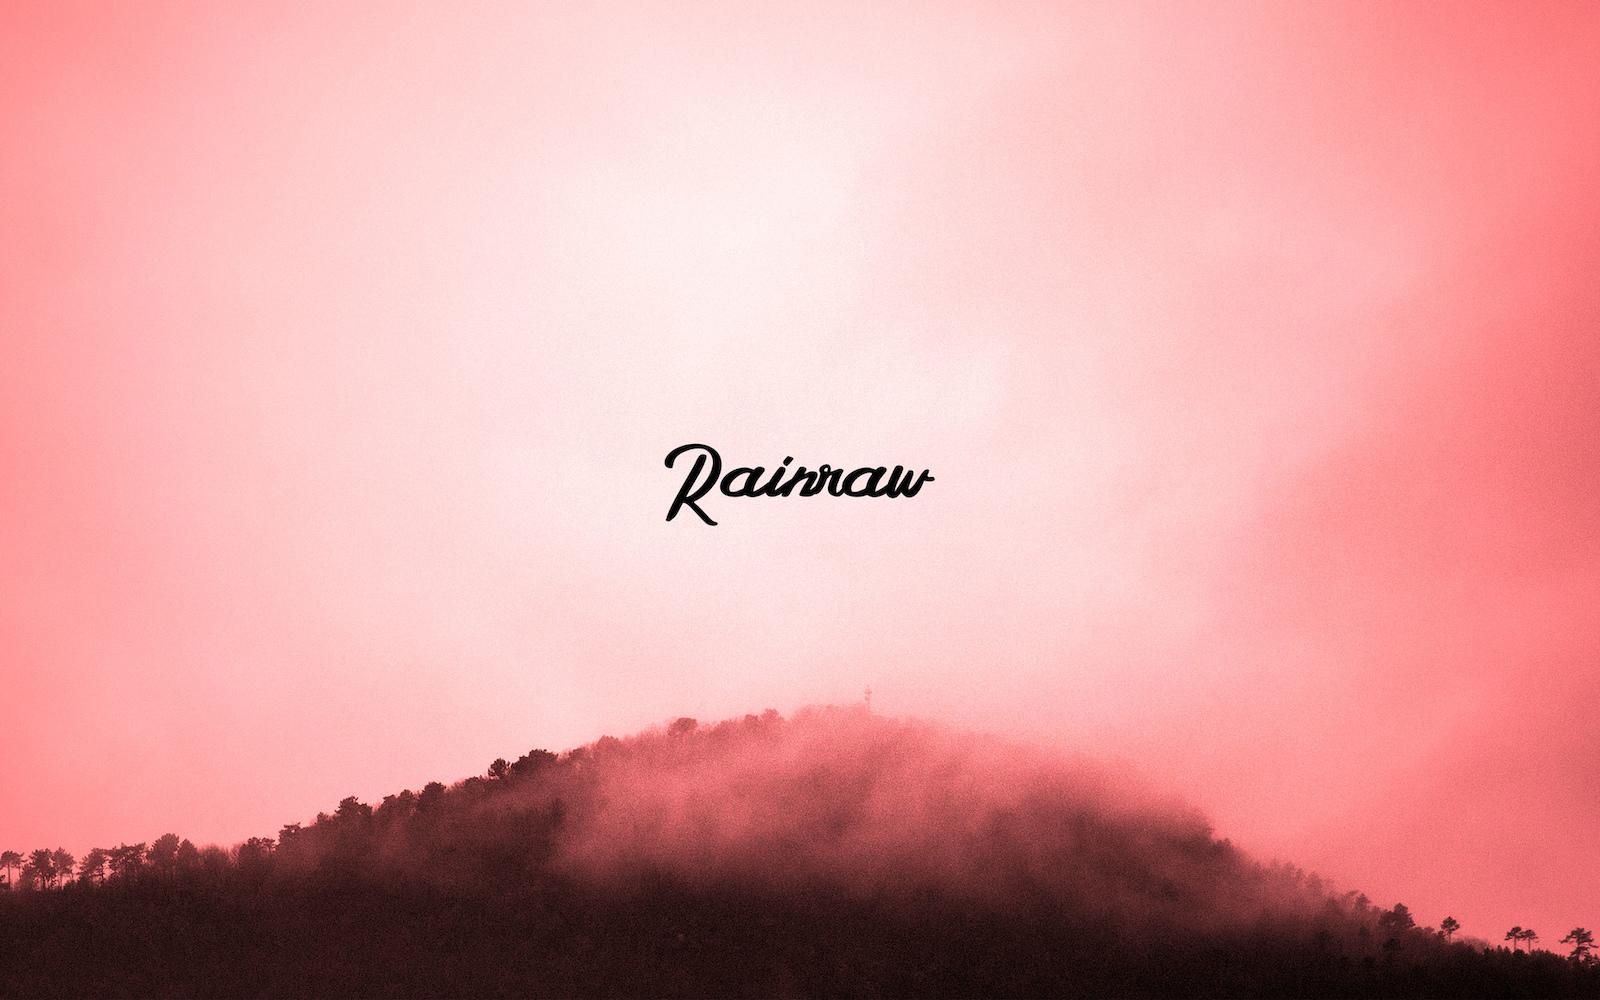 Rainraw